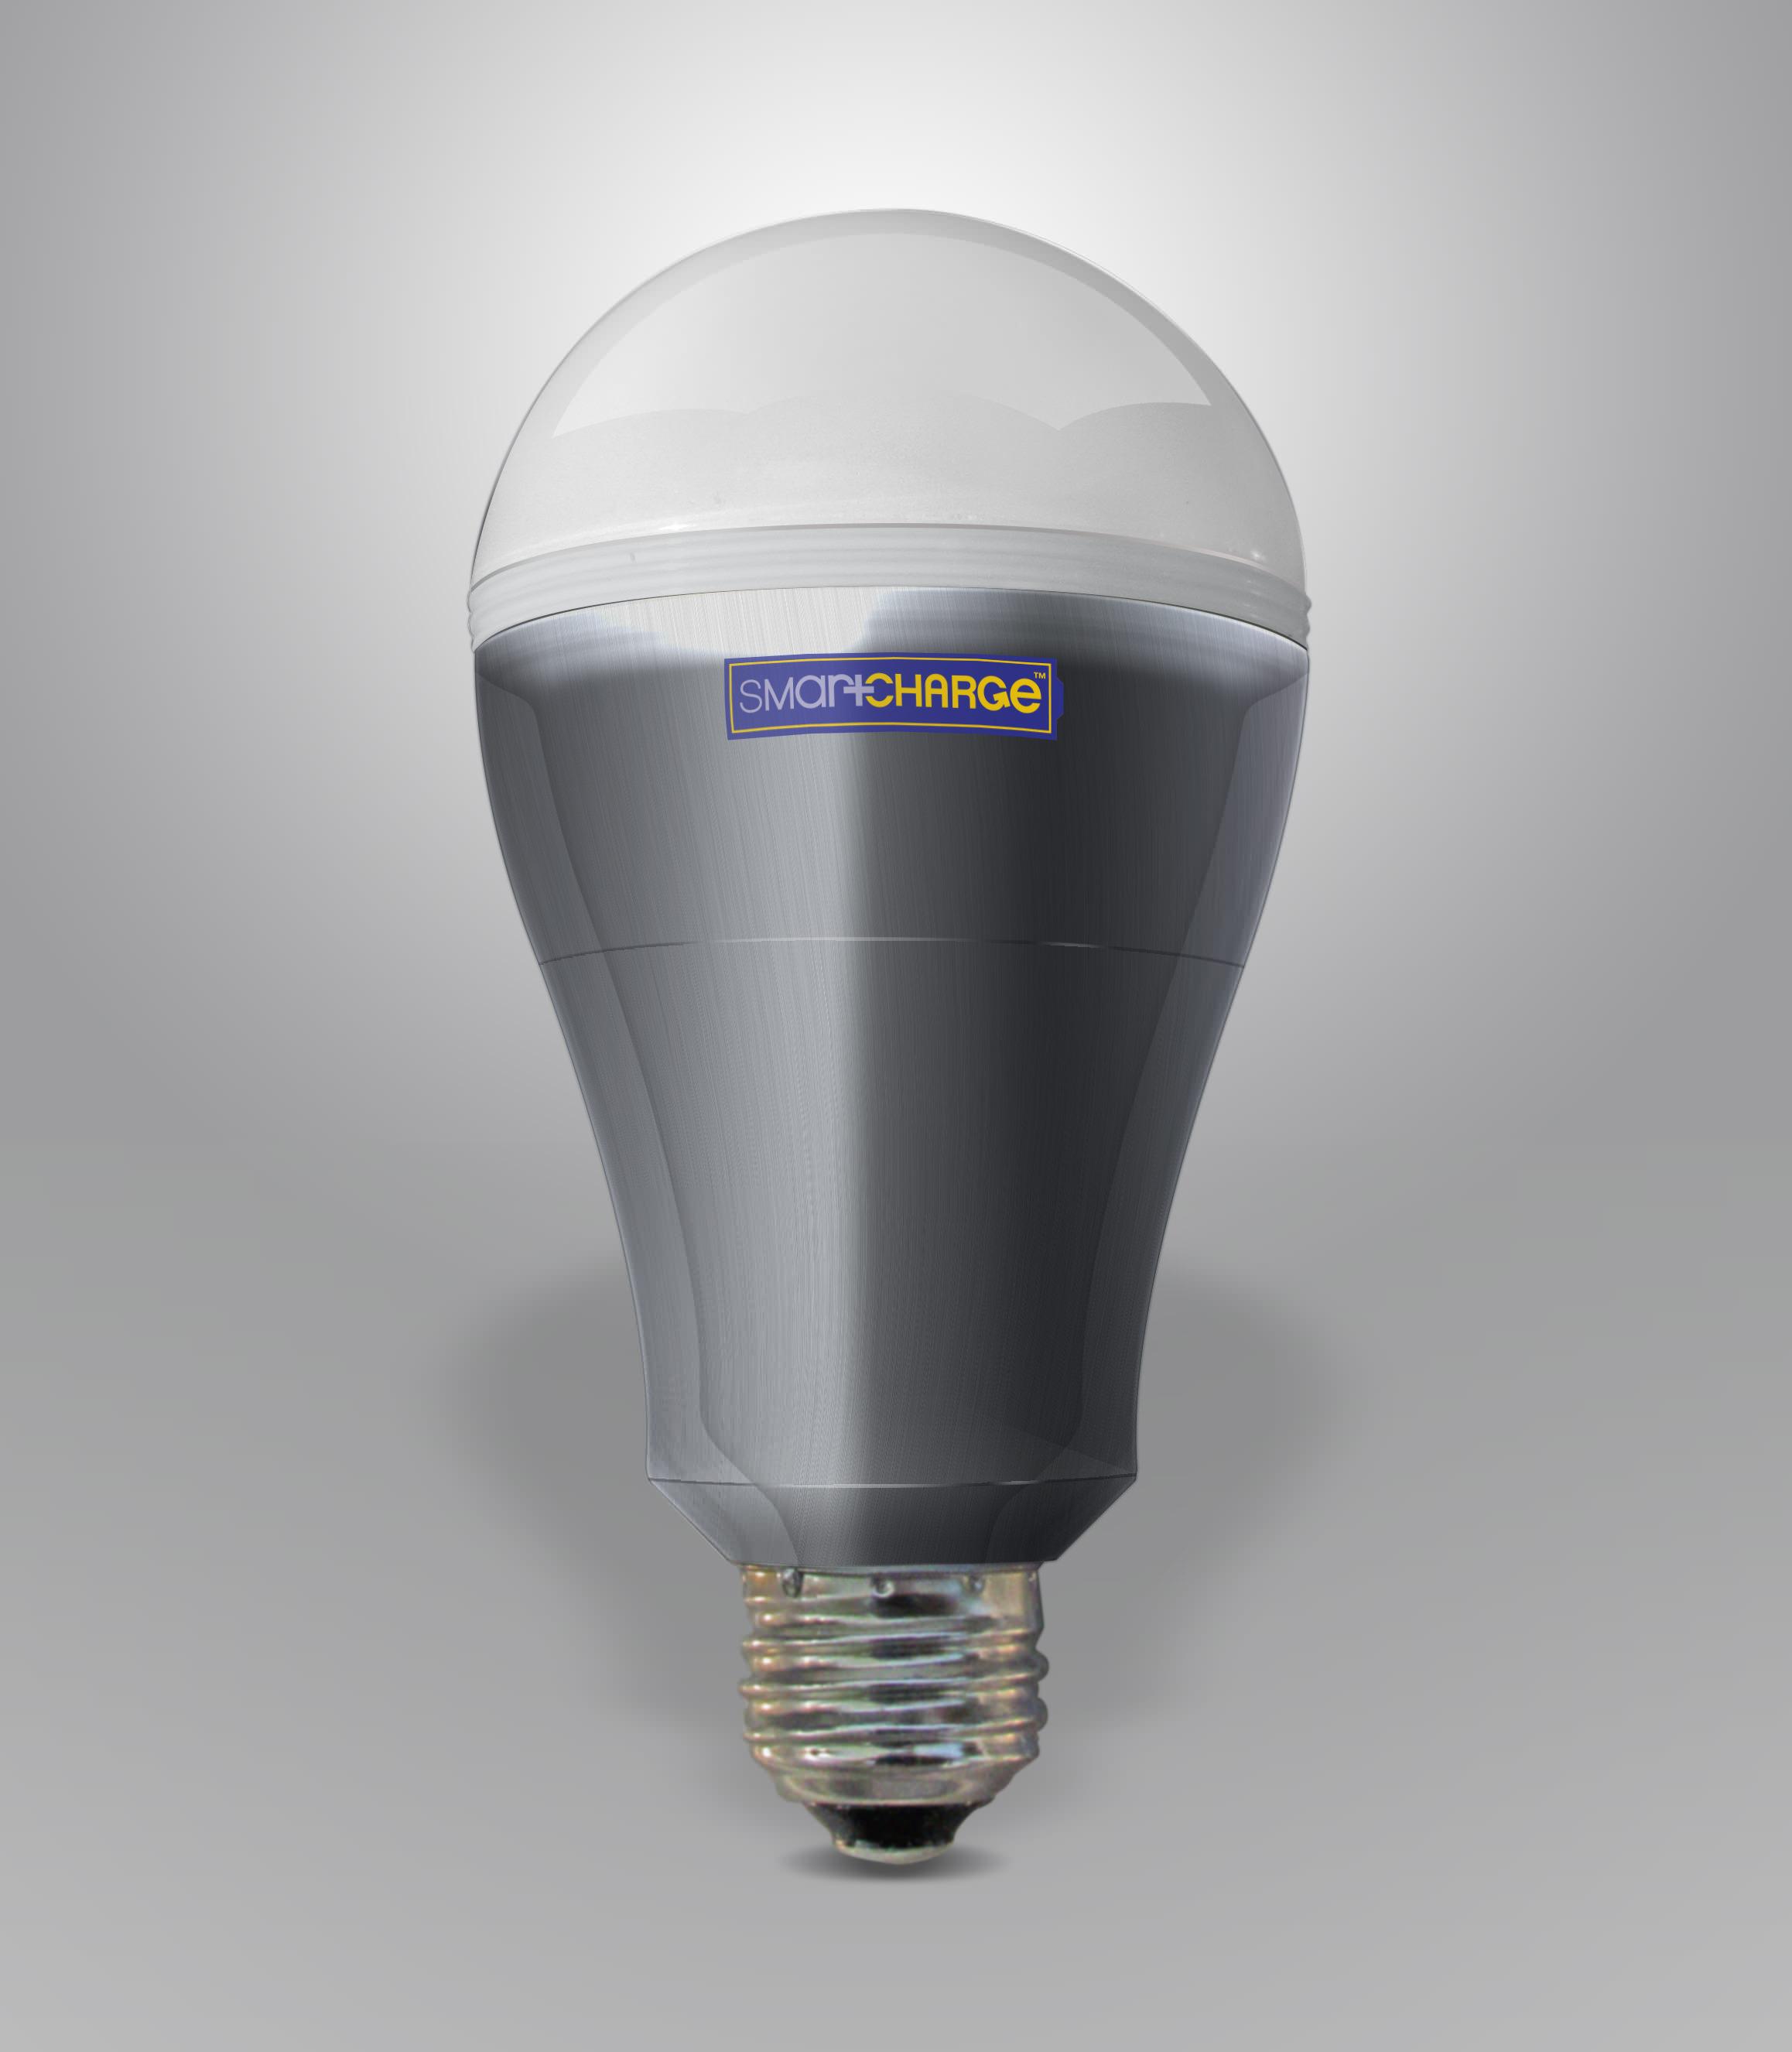 Led night light kickstarter - Matthews Nc Dec 30 2013 Http Www Myprgenie Com Smartchargetm Led Bulb Kickstarter Project From Ifi Systems Reached Its 50 000 Kickstarter Goal